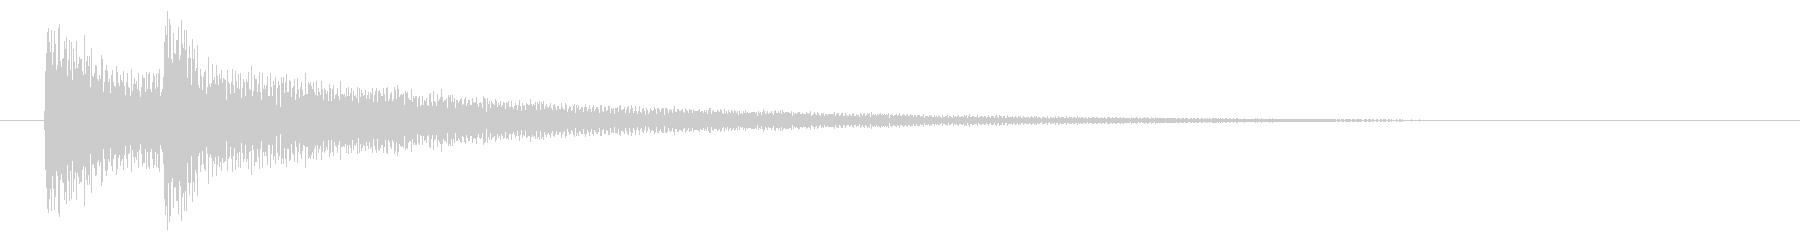 SF/ピコン↑/電子/決定音の未再生の波形